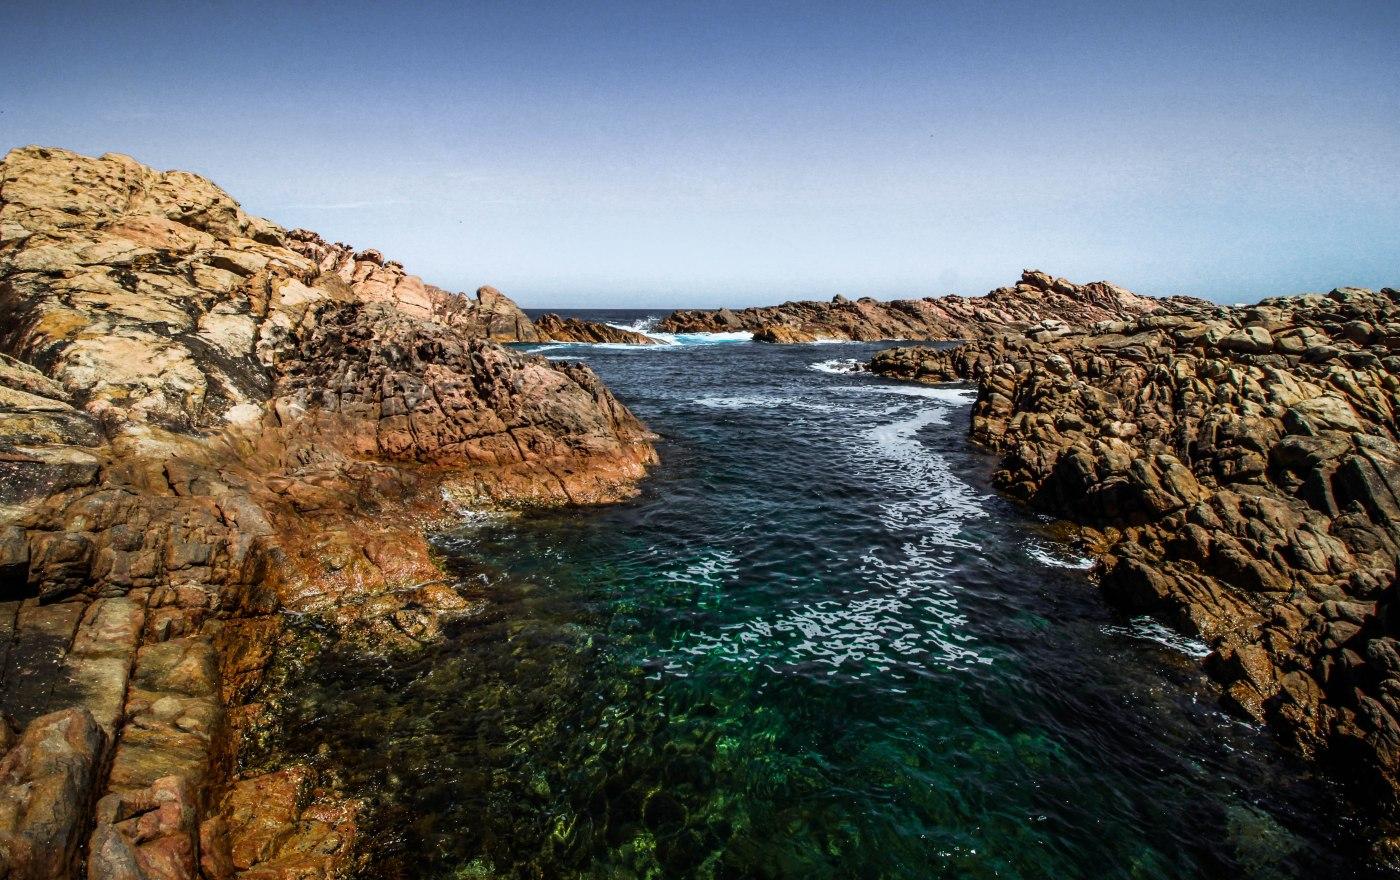 A Western Australia Road Trip Cape Naturaliste to Cape Leeuwin